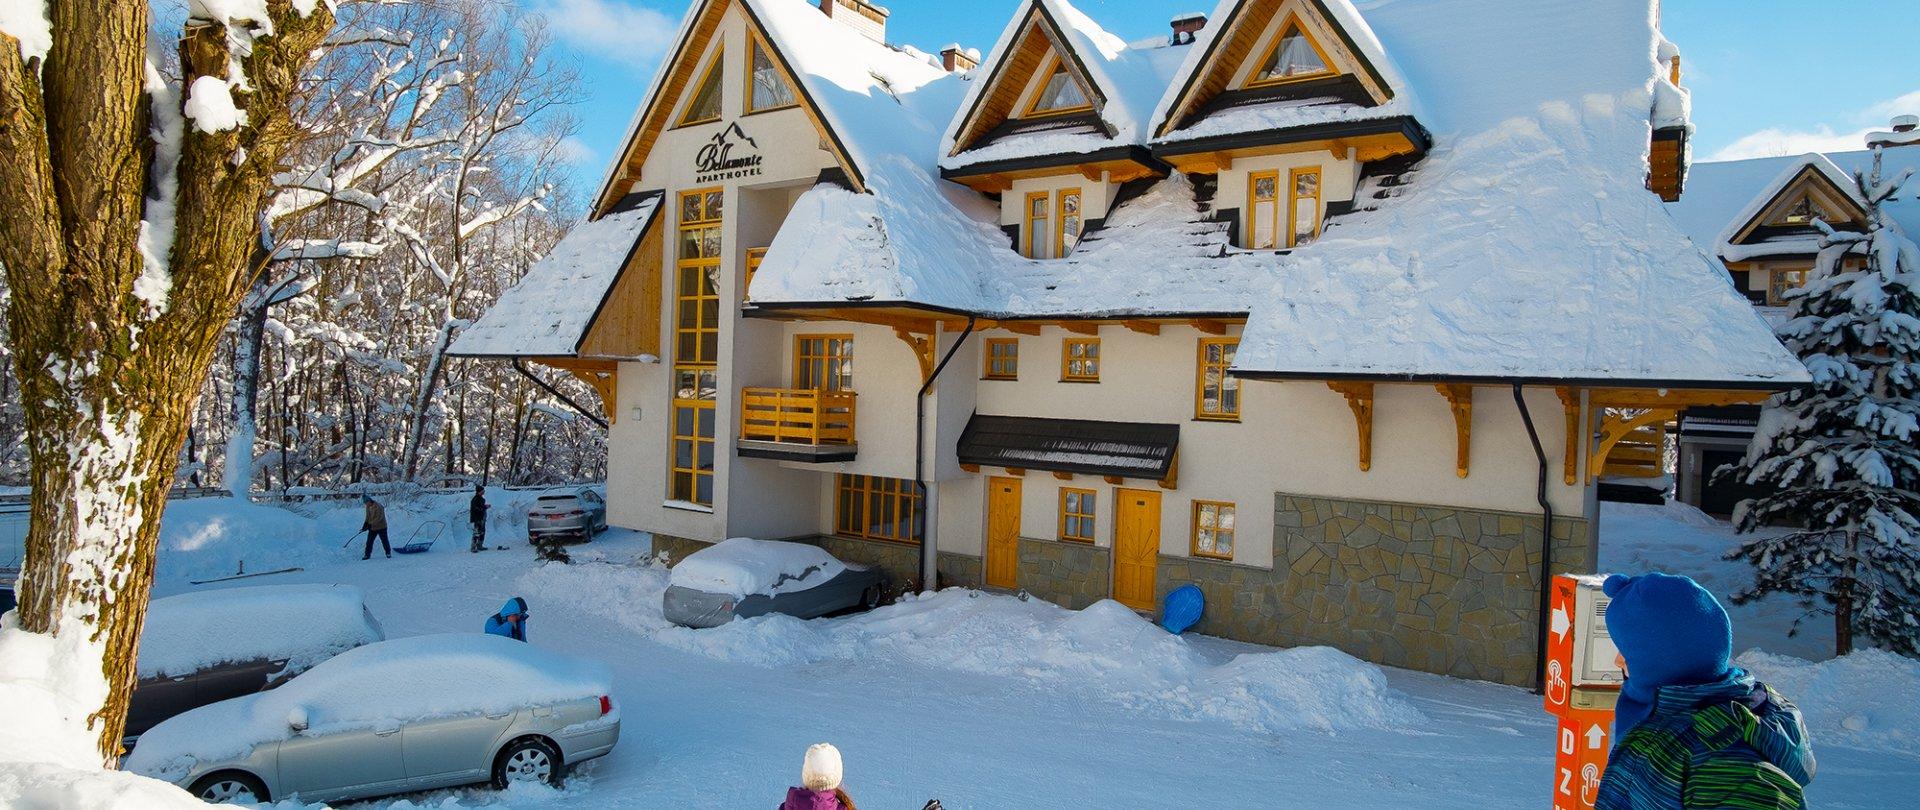 Magiczna zima w Bellamonte